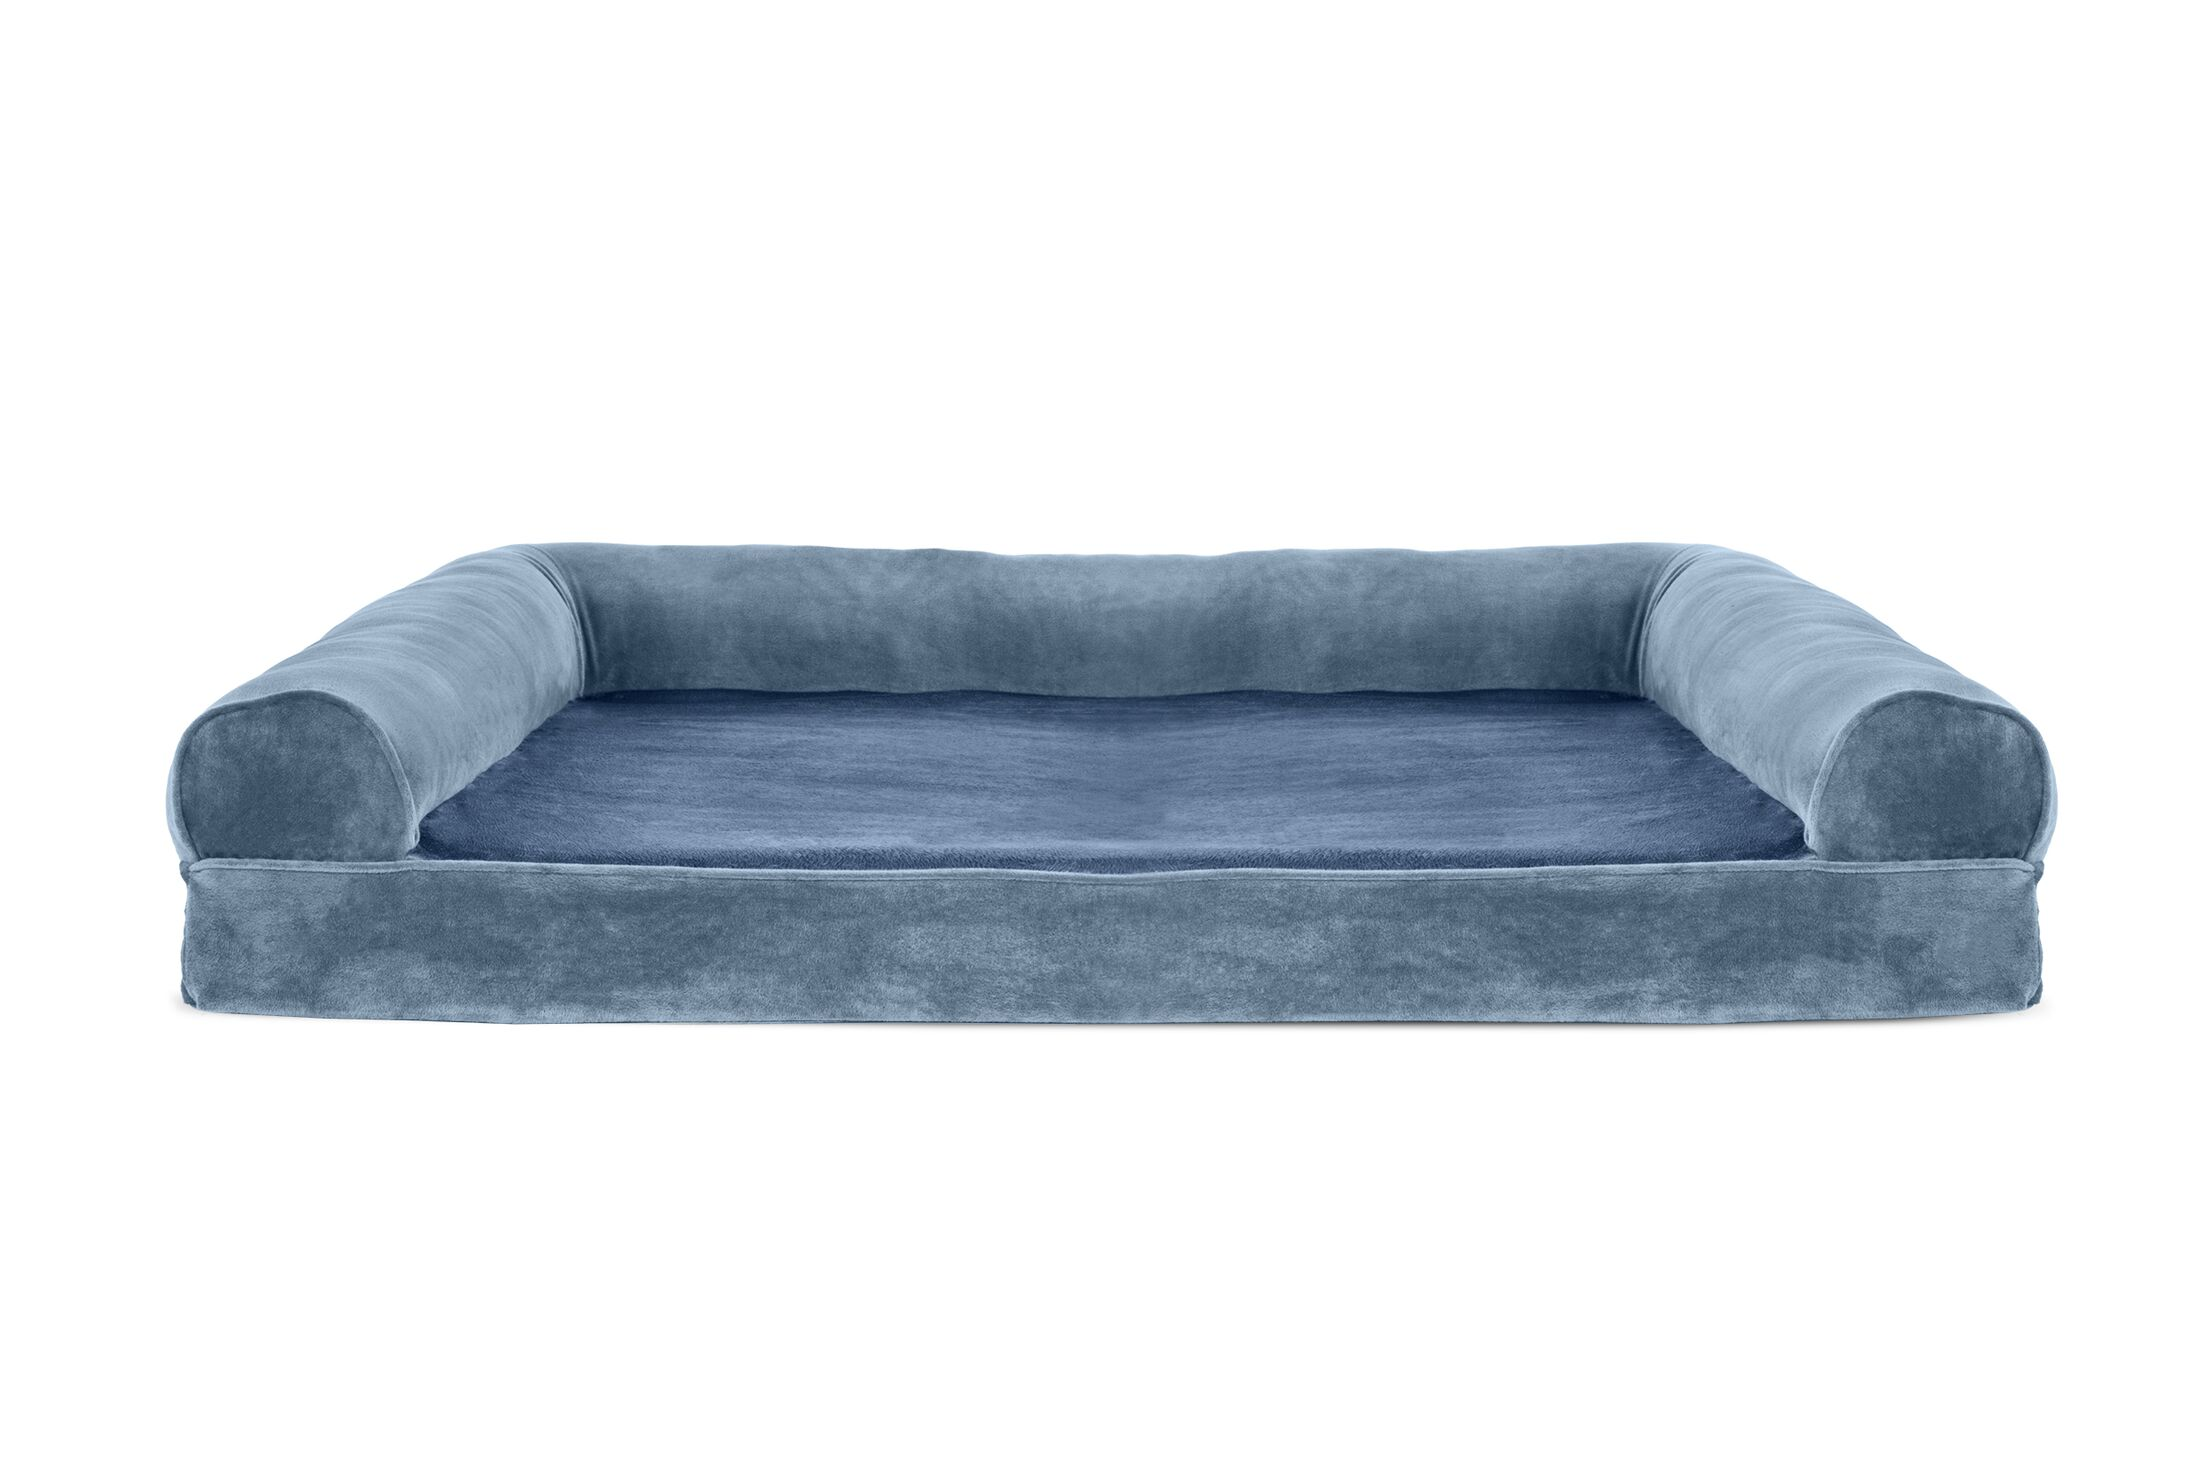 Asberry Faux Fur and Velvet Memory Top Dog Sofa Size: Jumbo (44